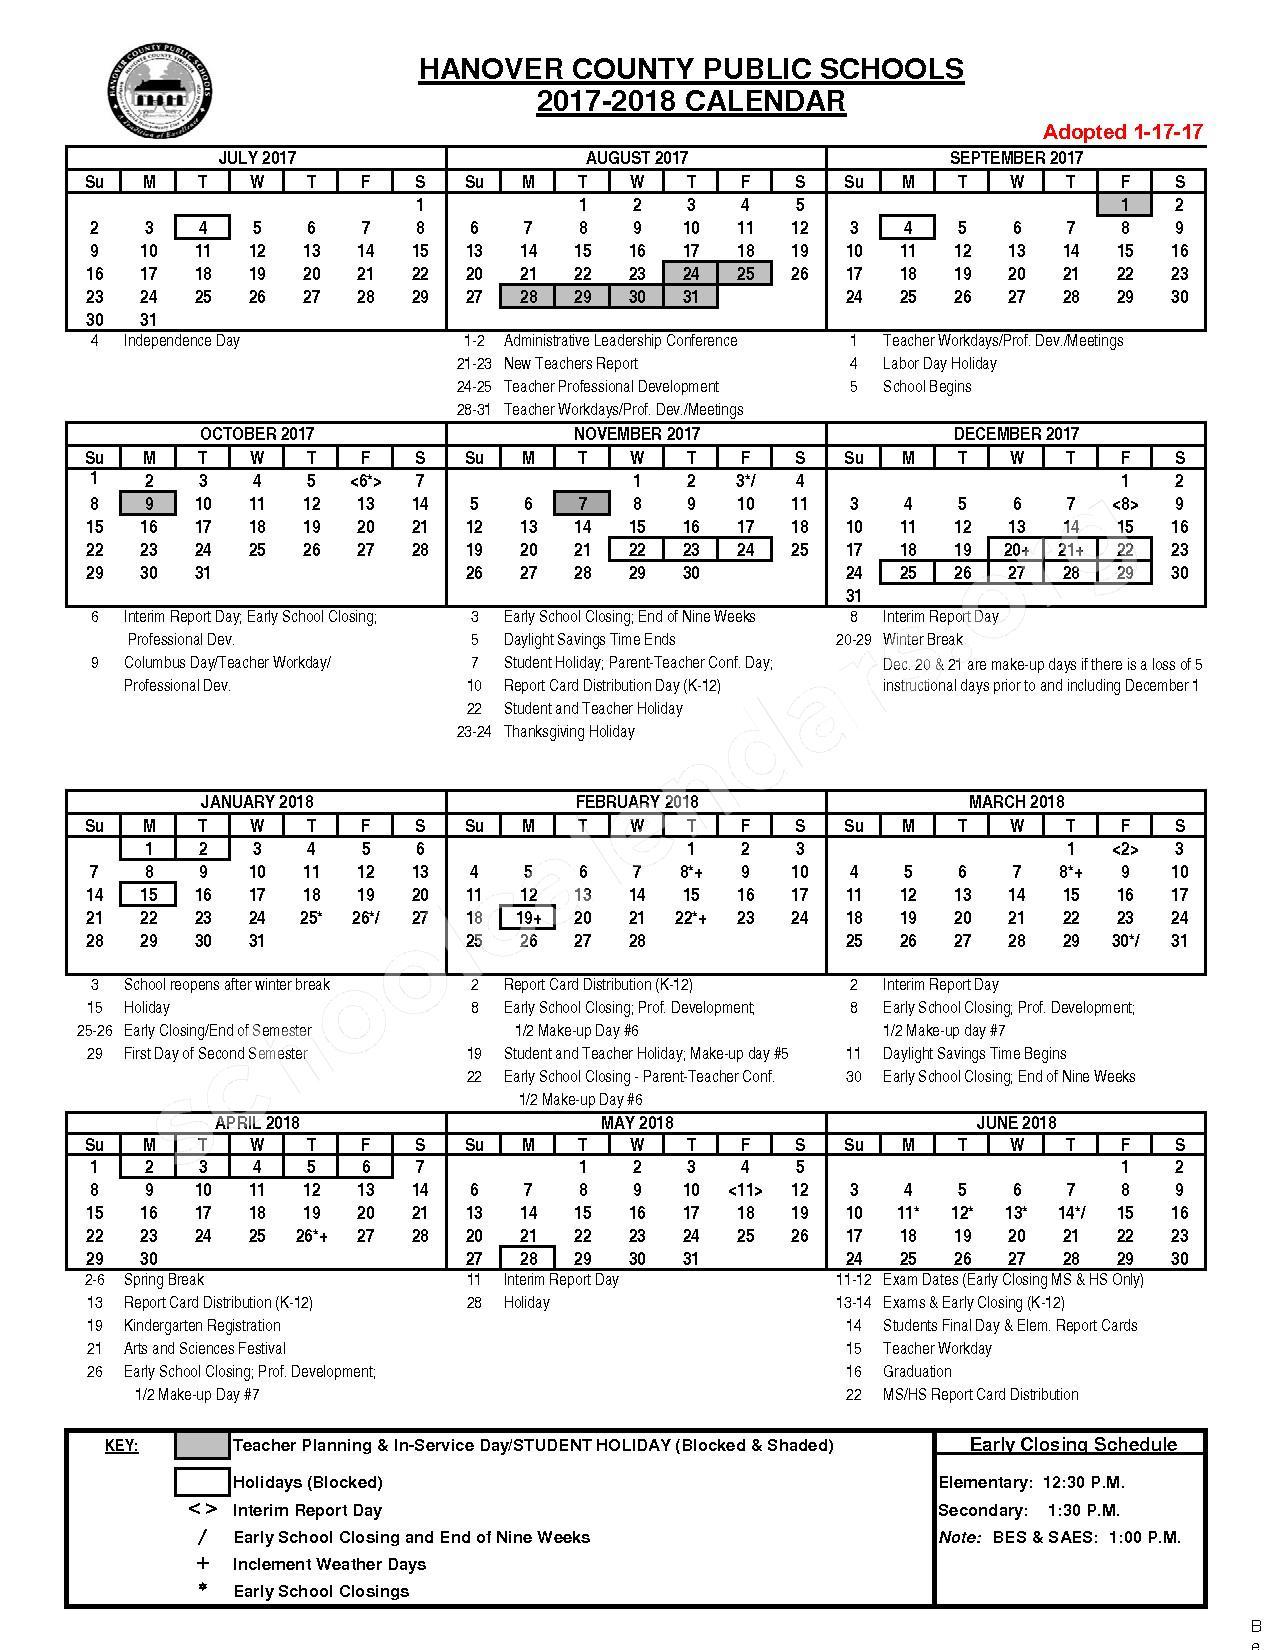 Hcps 2017 2018 Calendar